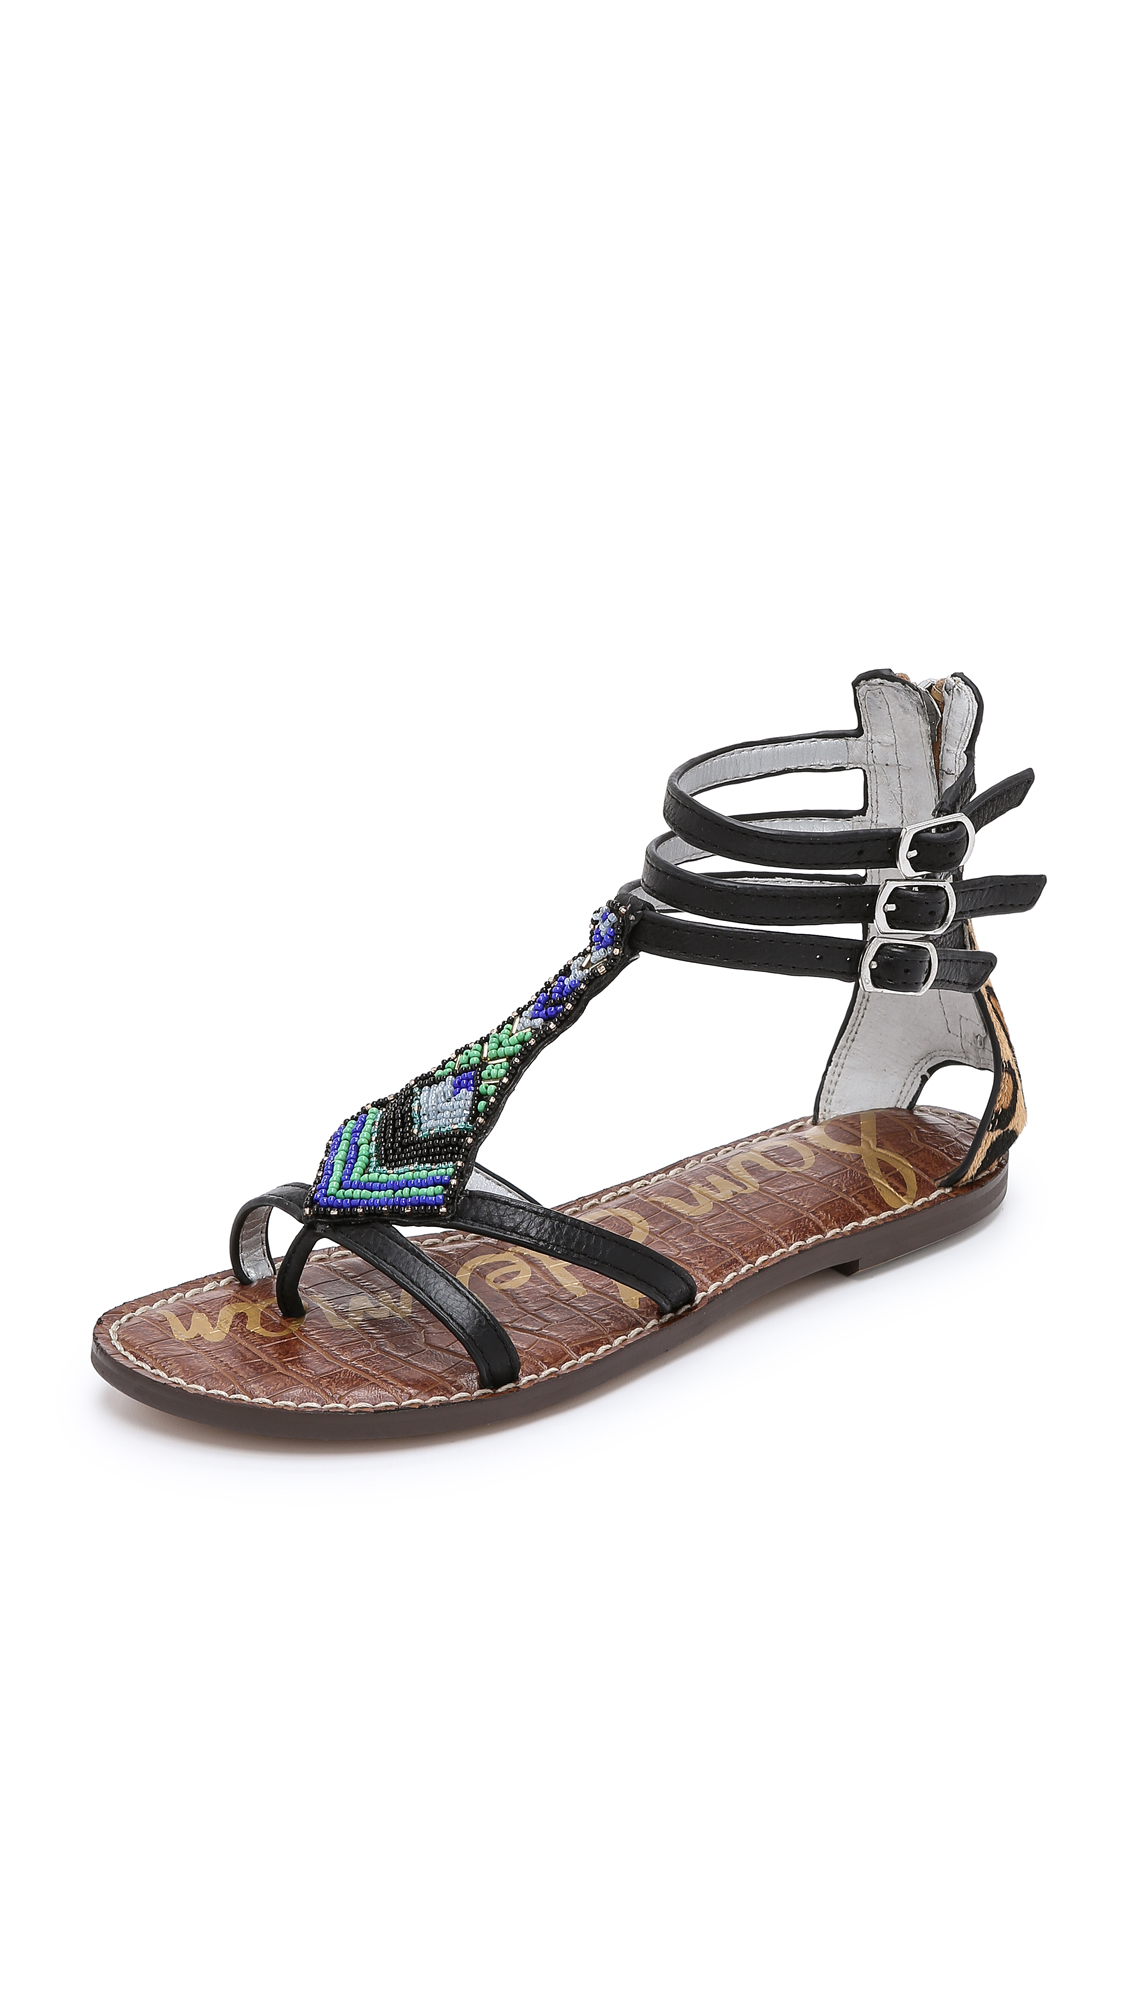 183eaa5fb859eb Lyst - Sam Edelman Giselle Beaded Sandals - Black new Nude Leopard